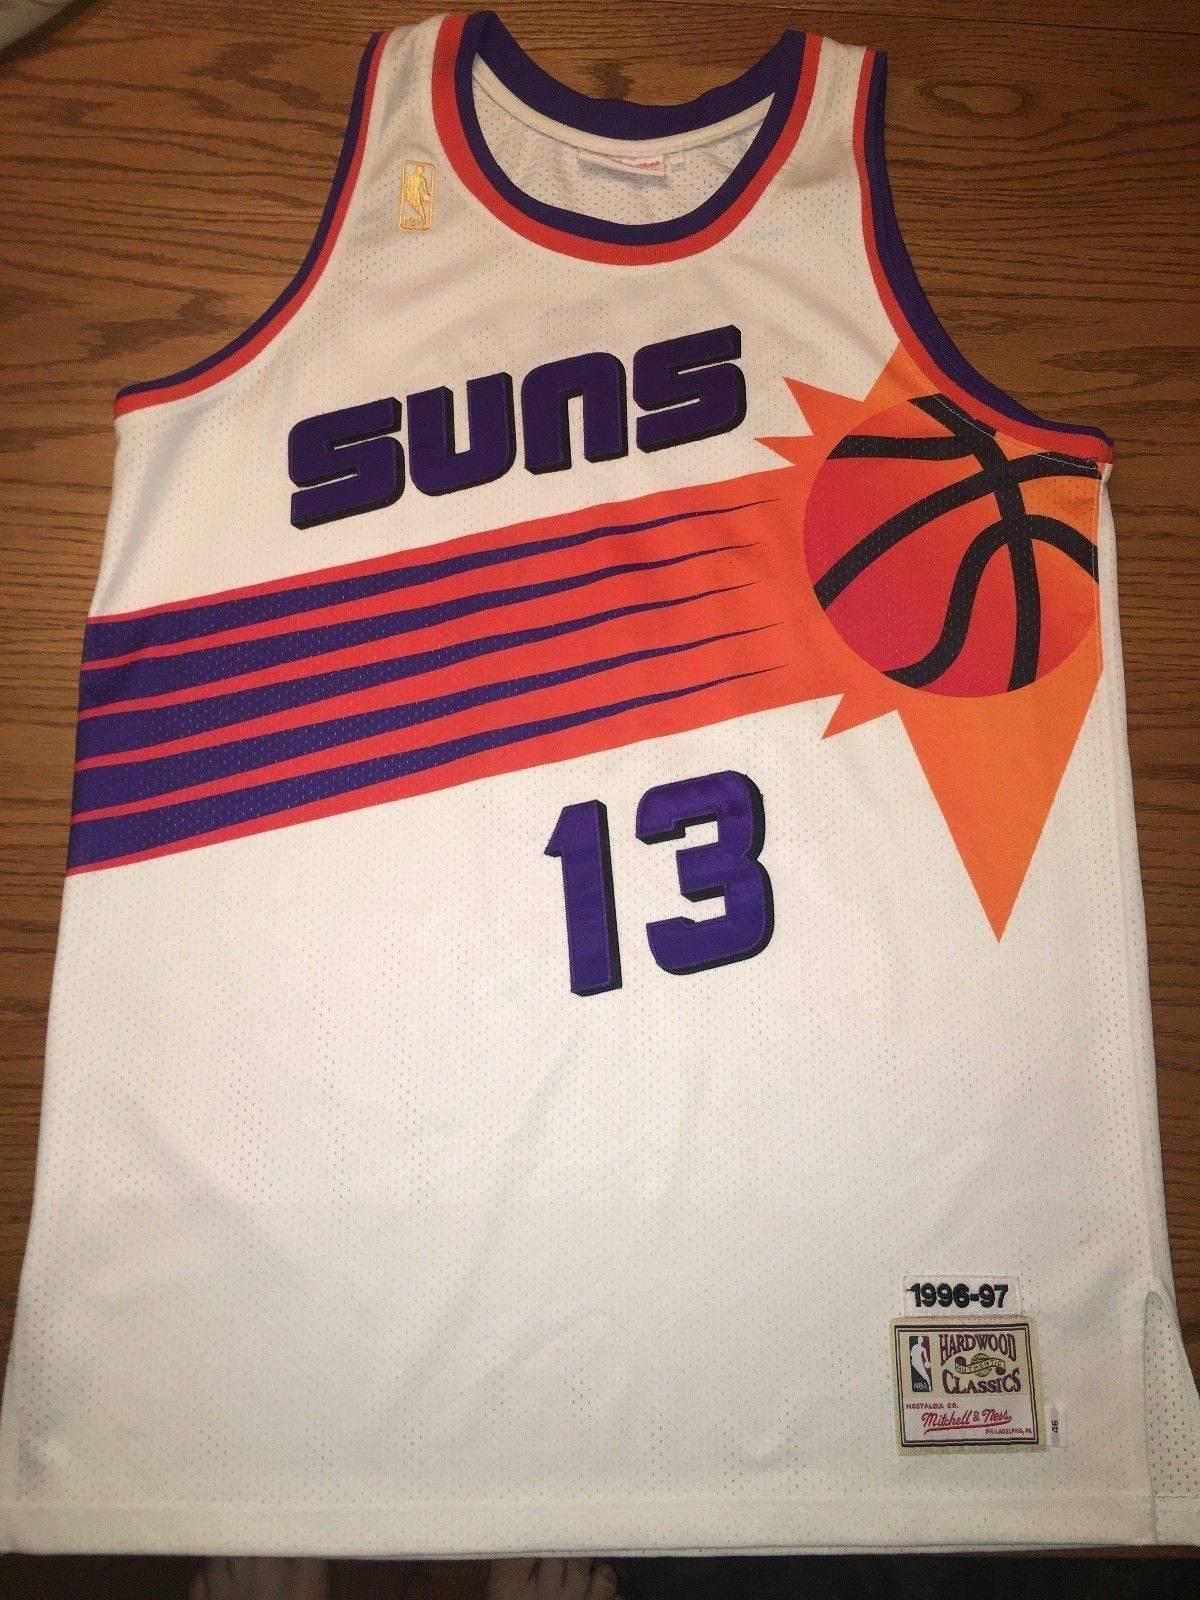 Mitchell /& Ness Steve Nash 1996-97 Phoenix Suns Season Authentic NBA Jersey